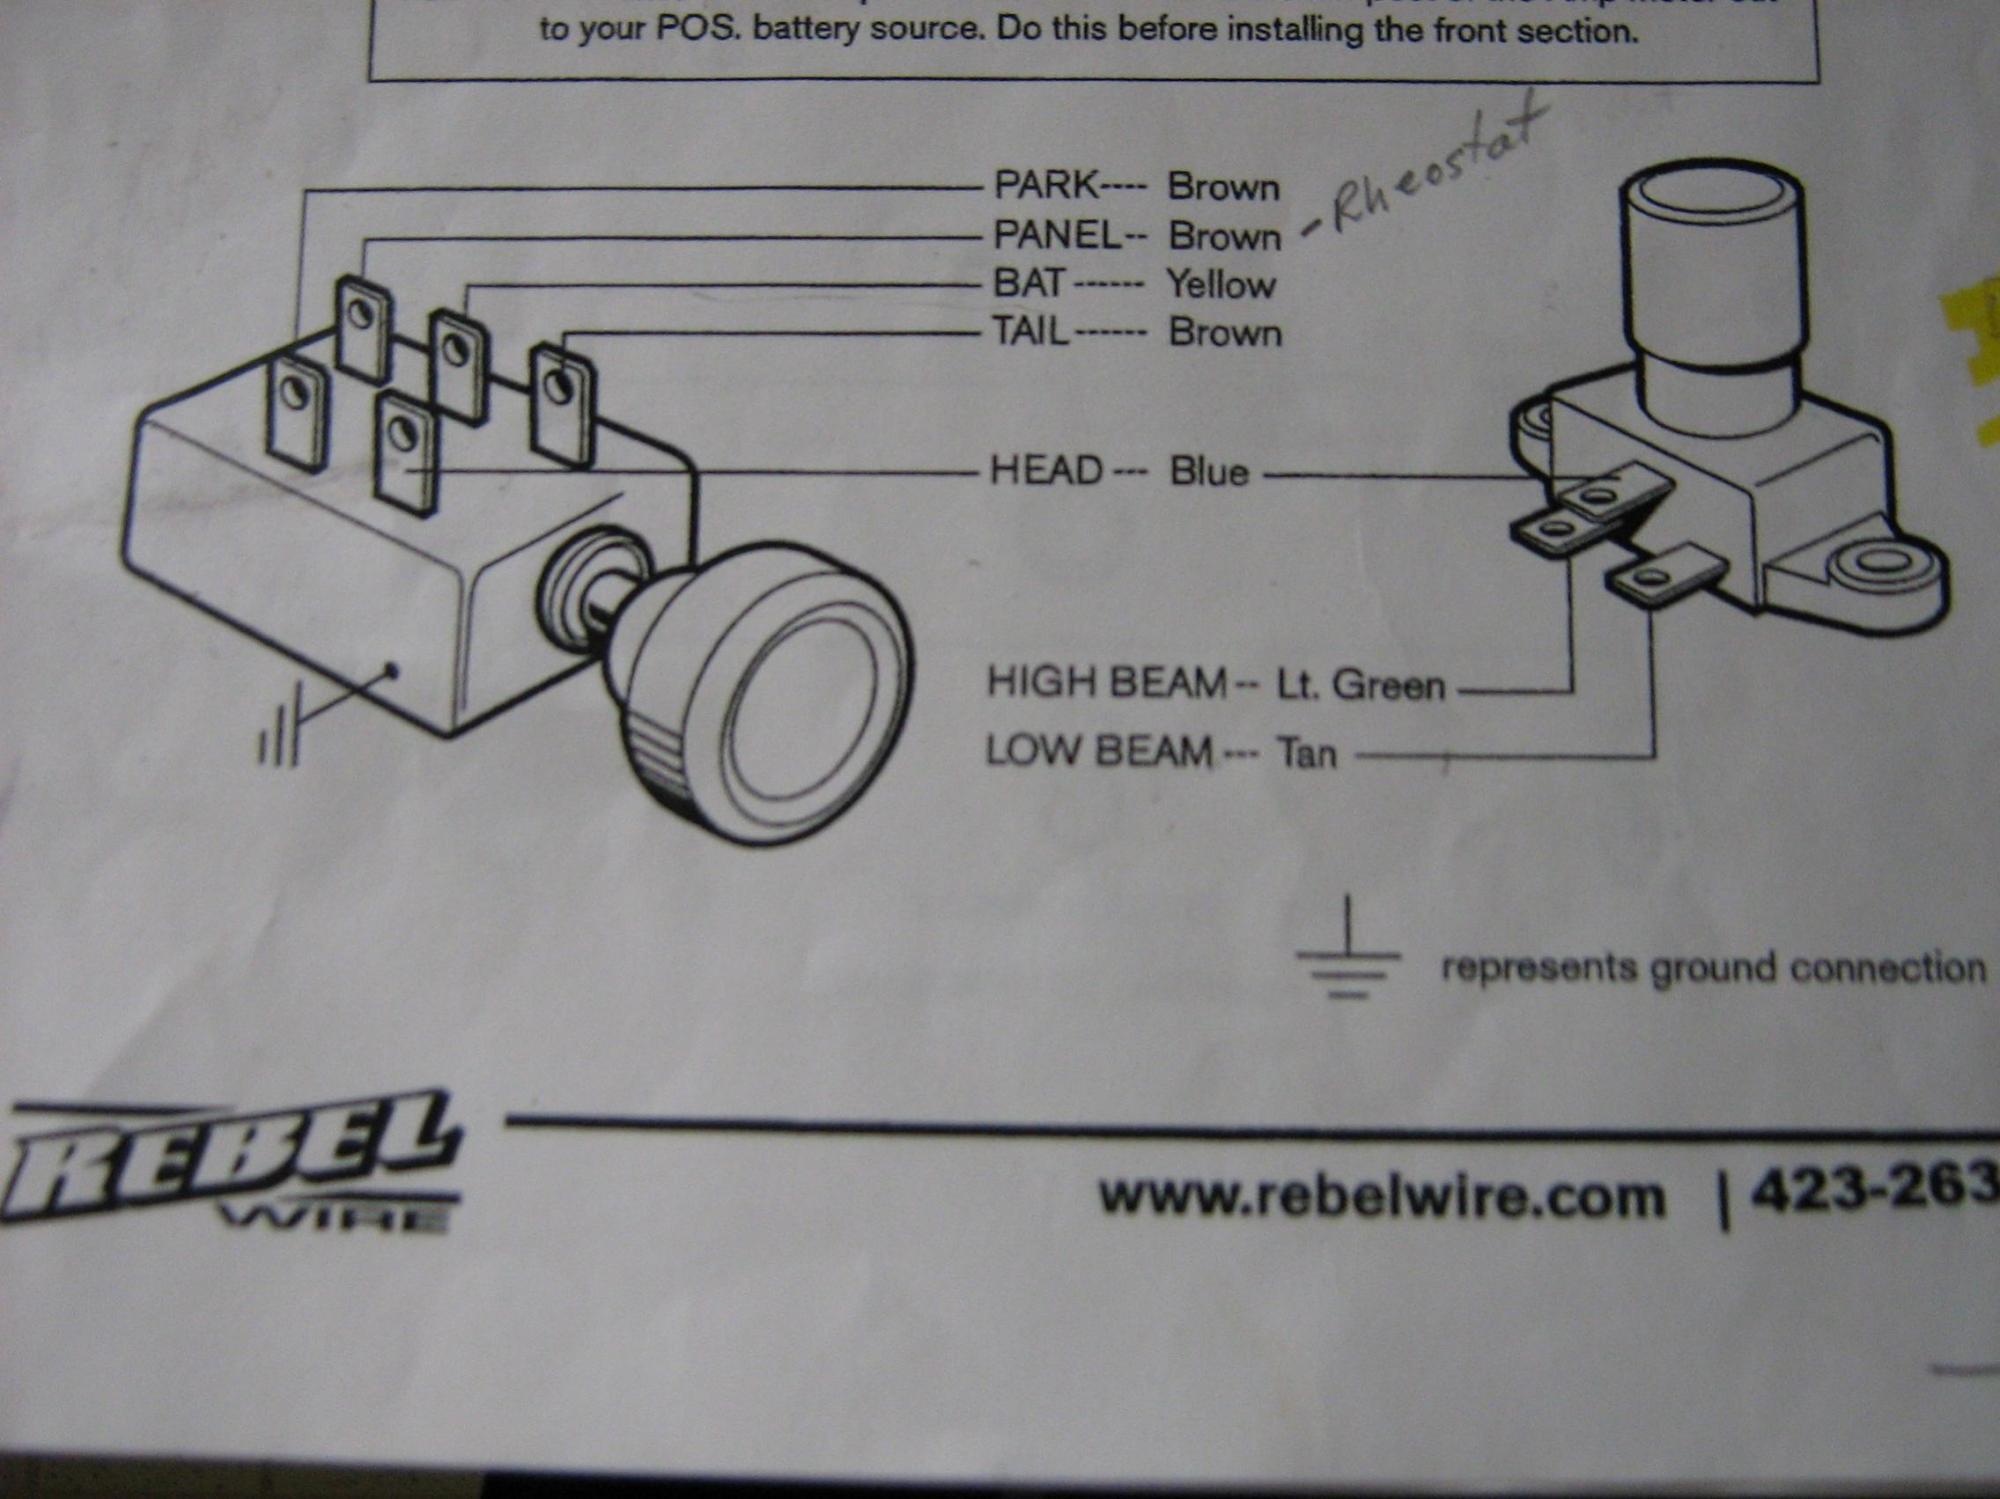 hight resolution of 25 fantastic 1985 honda rebel 250 wiring diagram myrawalakot source lets see wire diagrams for